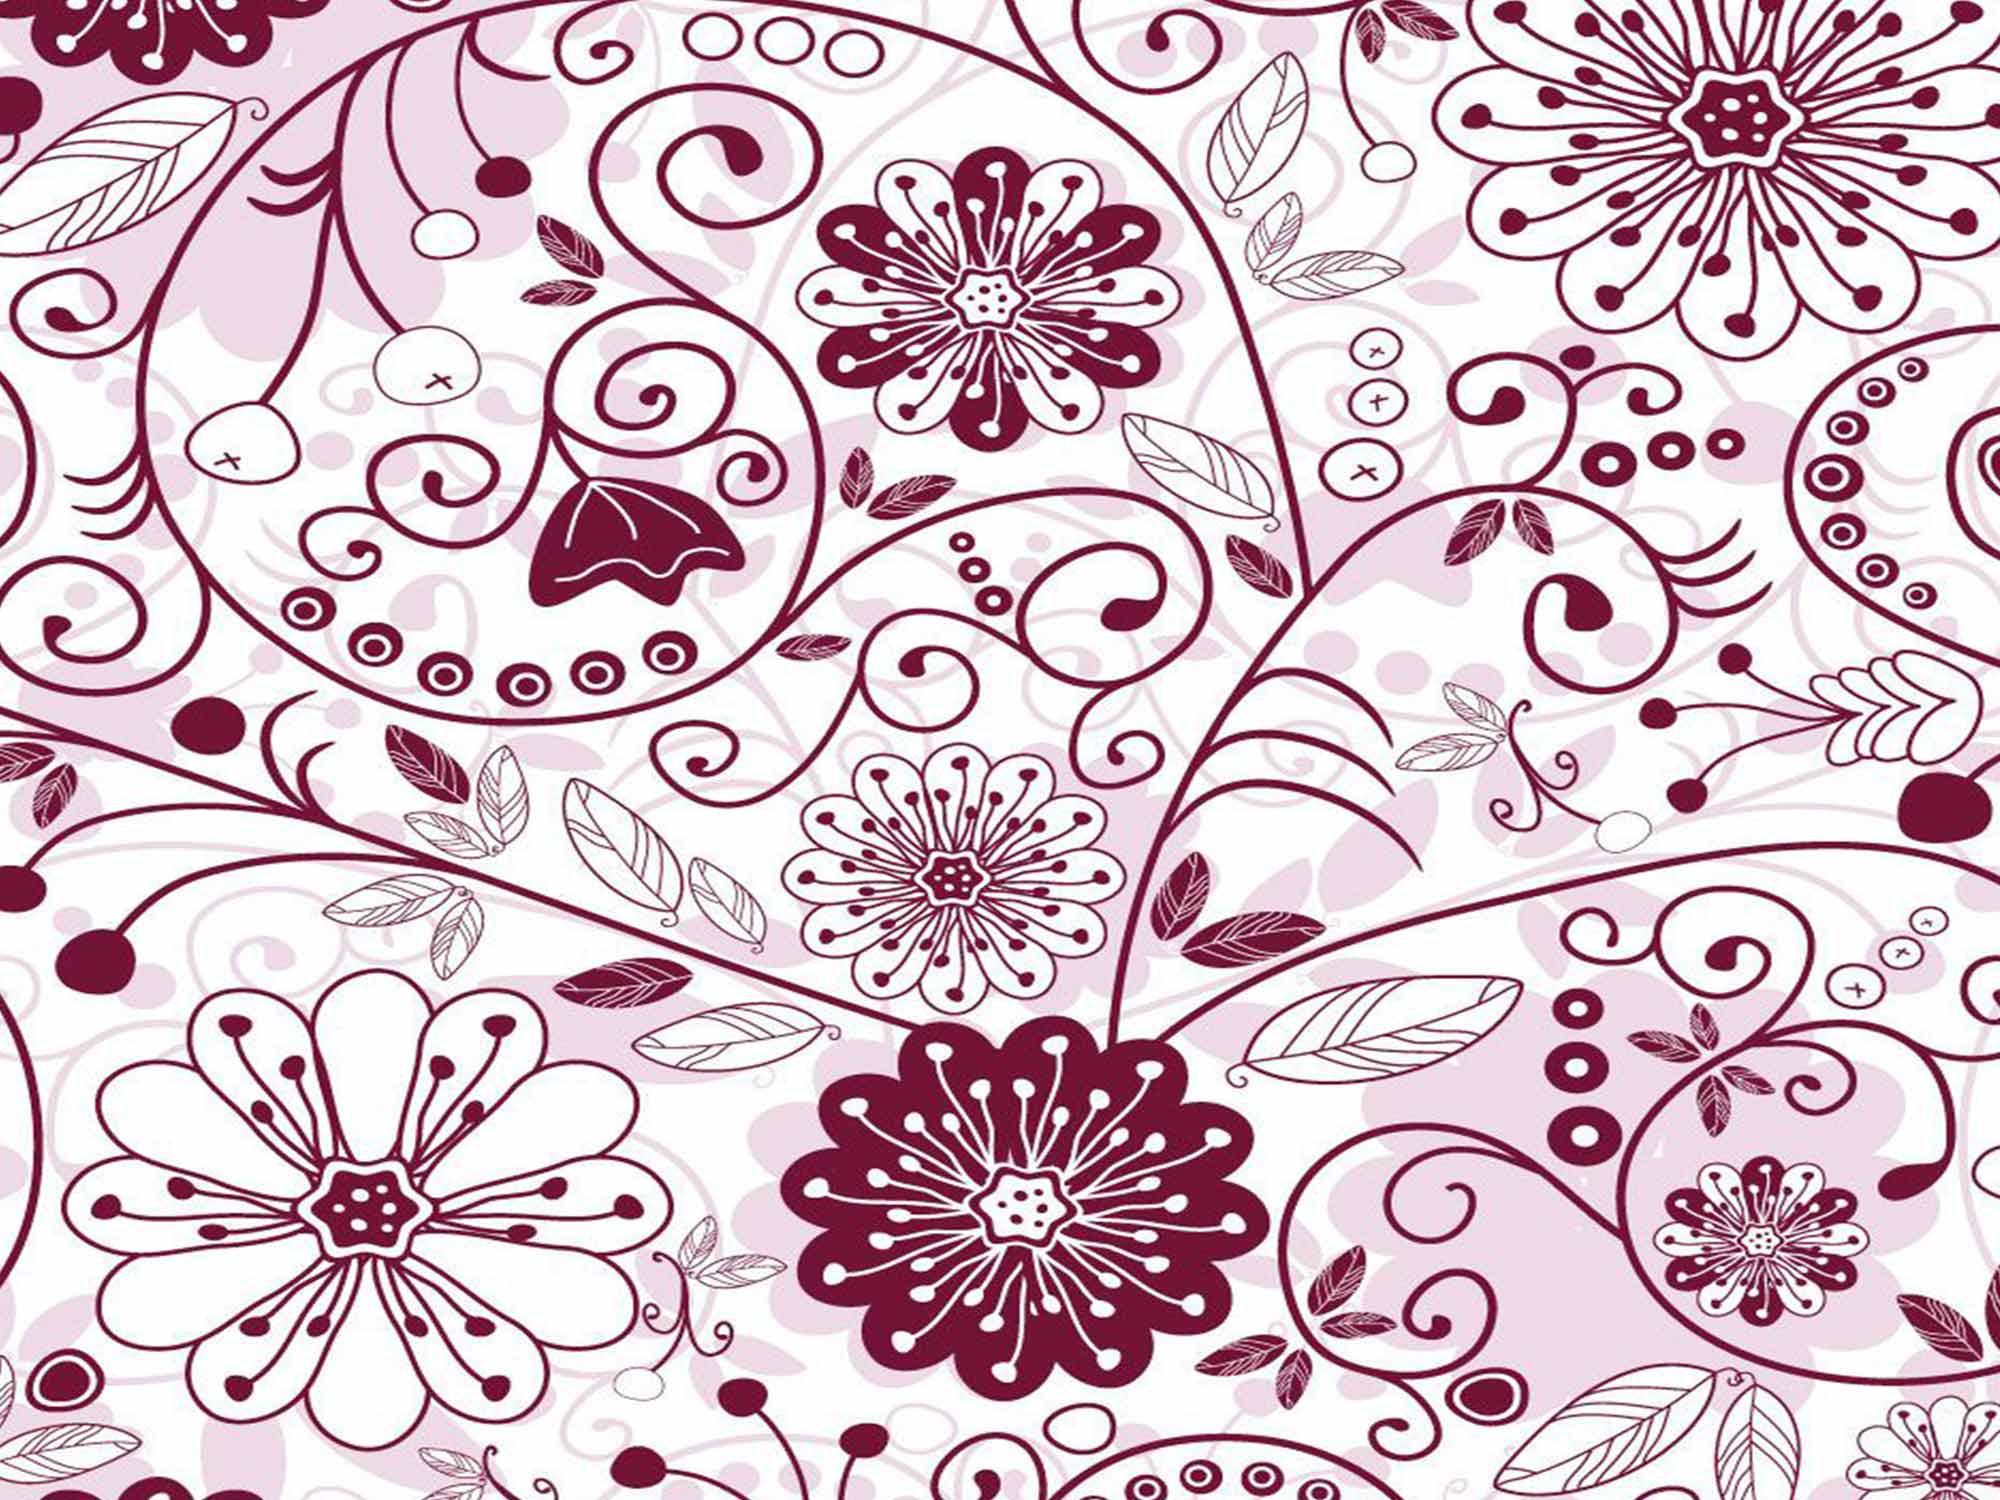 Papel de Parede Floral 0010 - Adesivos de Parede  - Paredes Decoradas